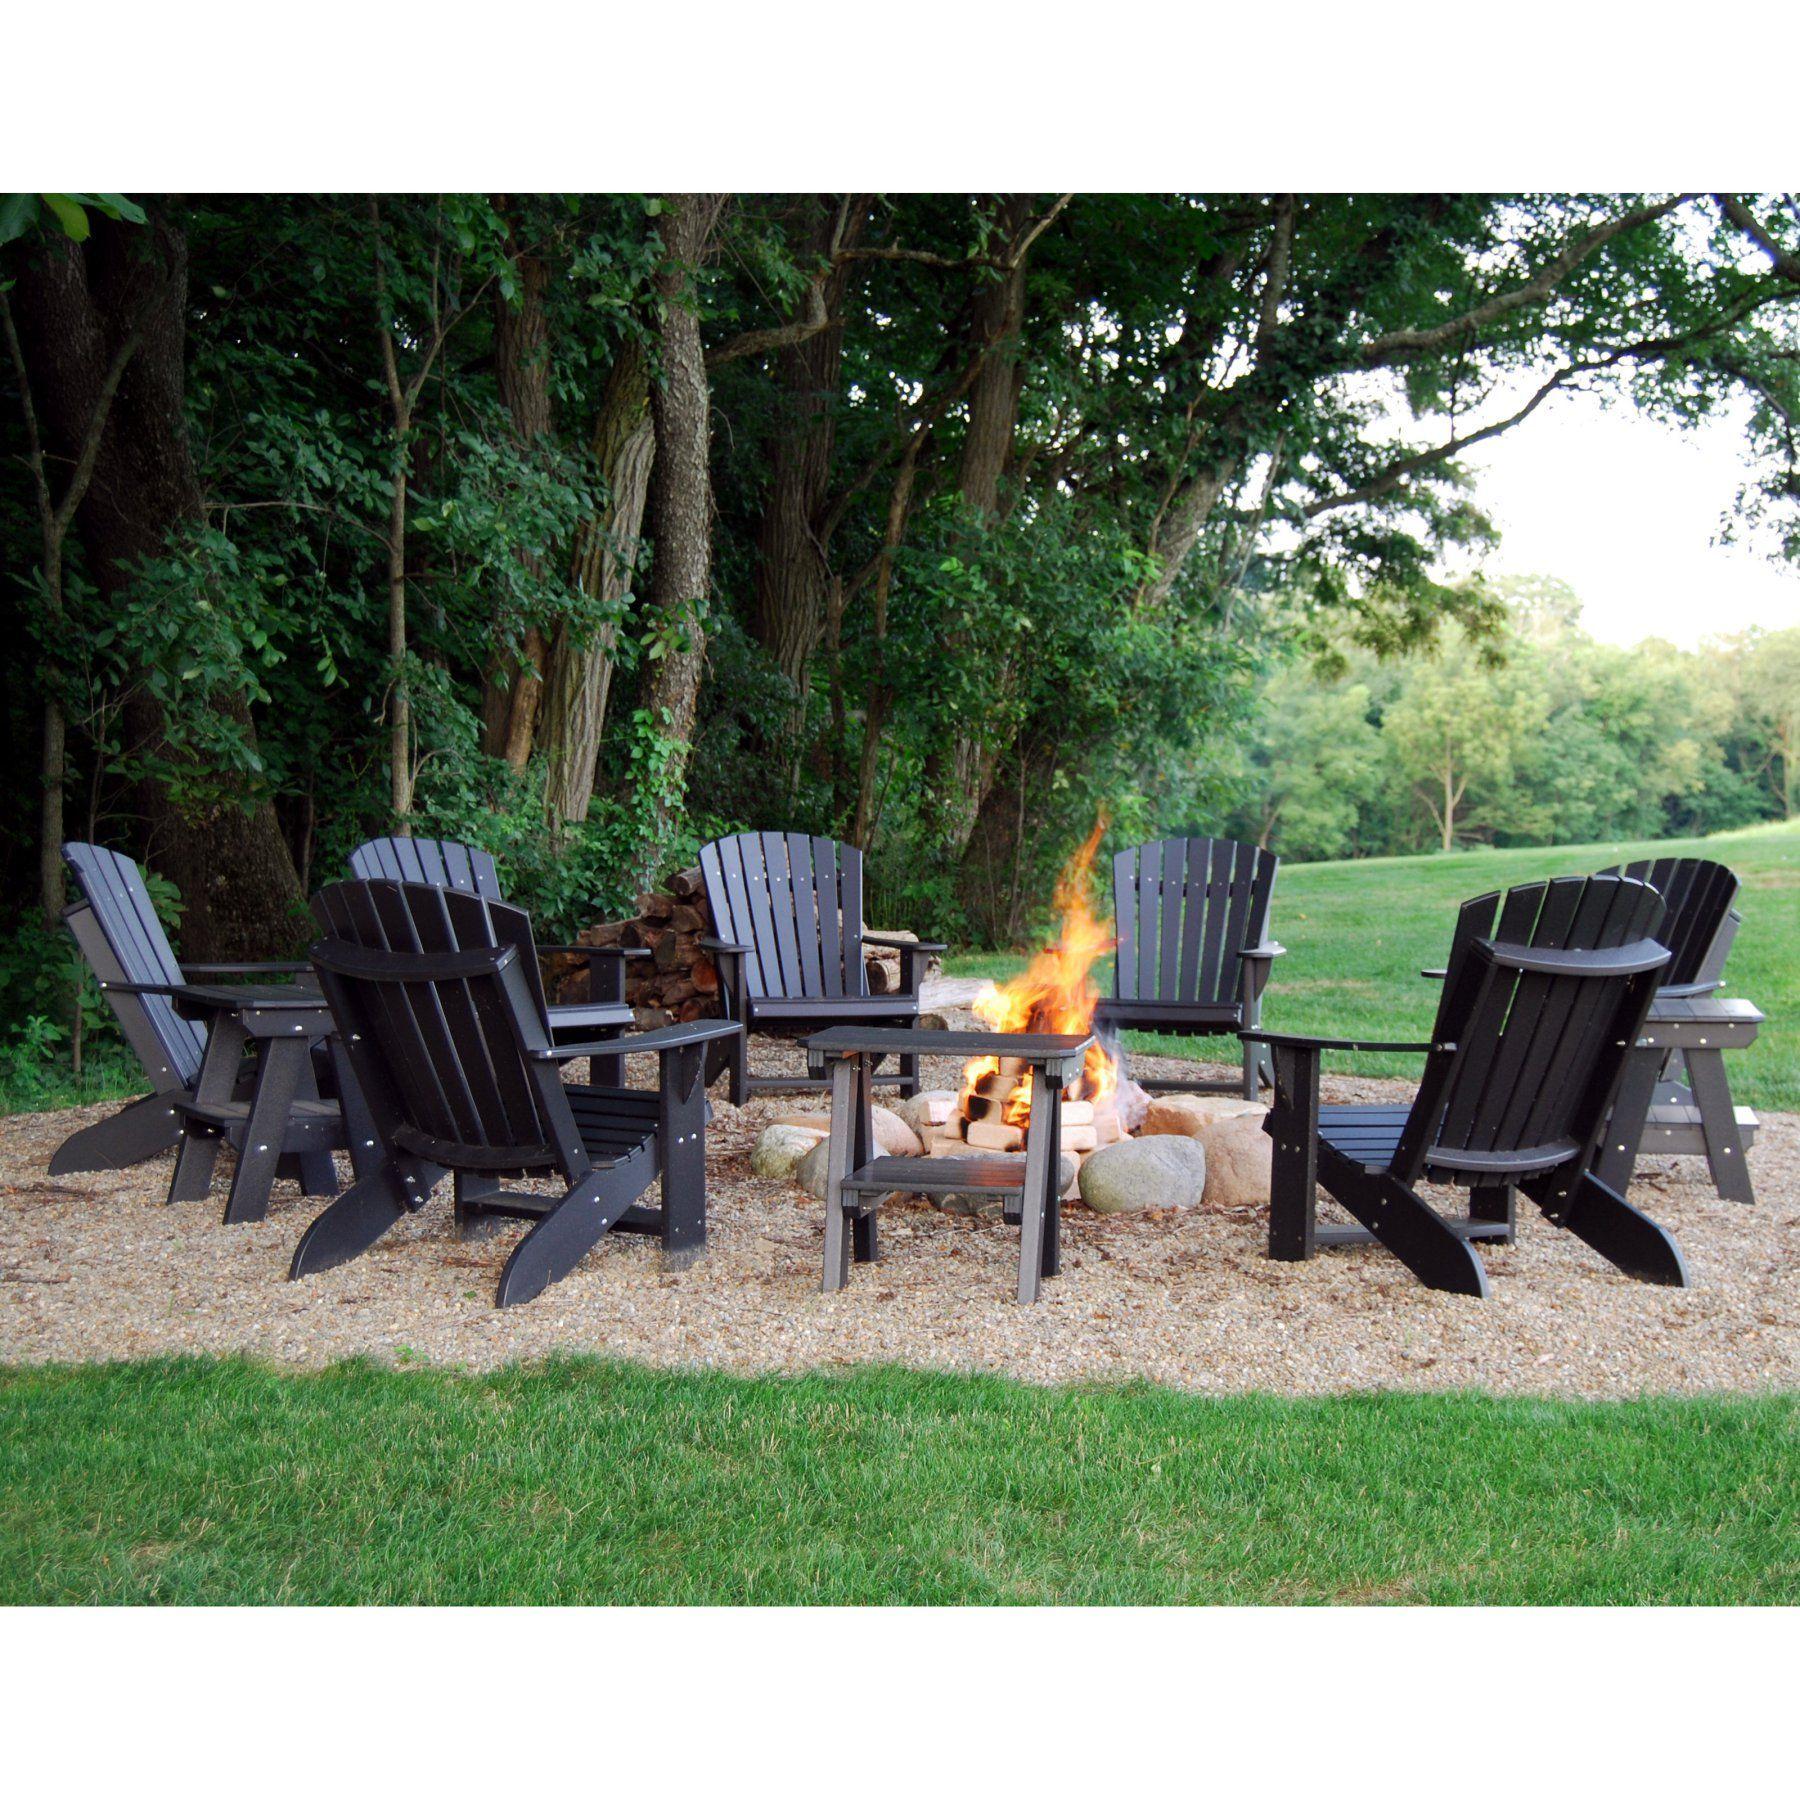 Outdoor WILDRIDGE Heritage Adirondack Chair - LCC-114 ...